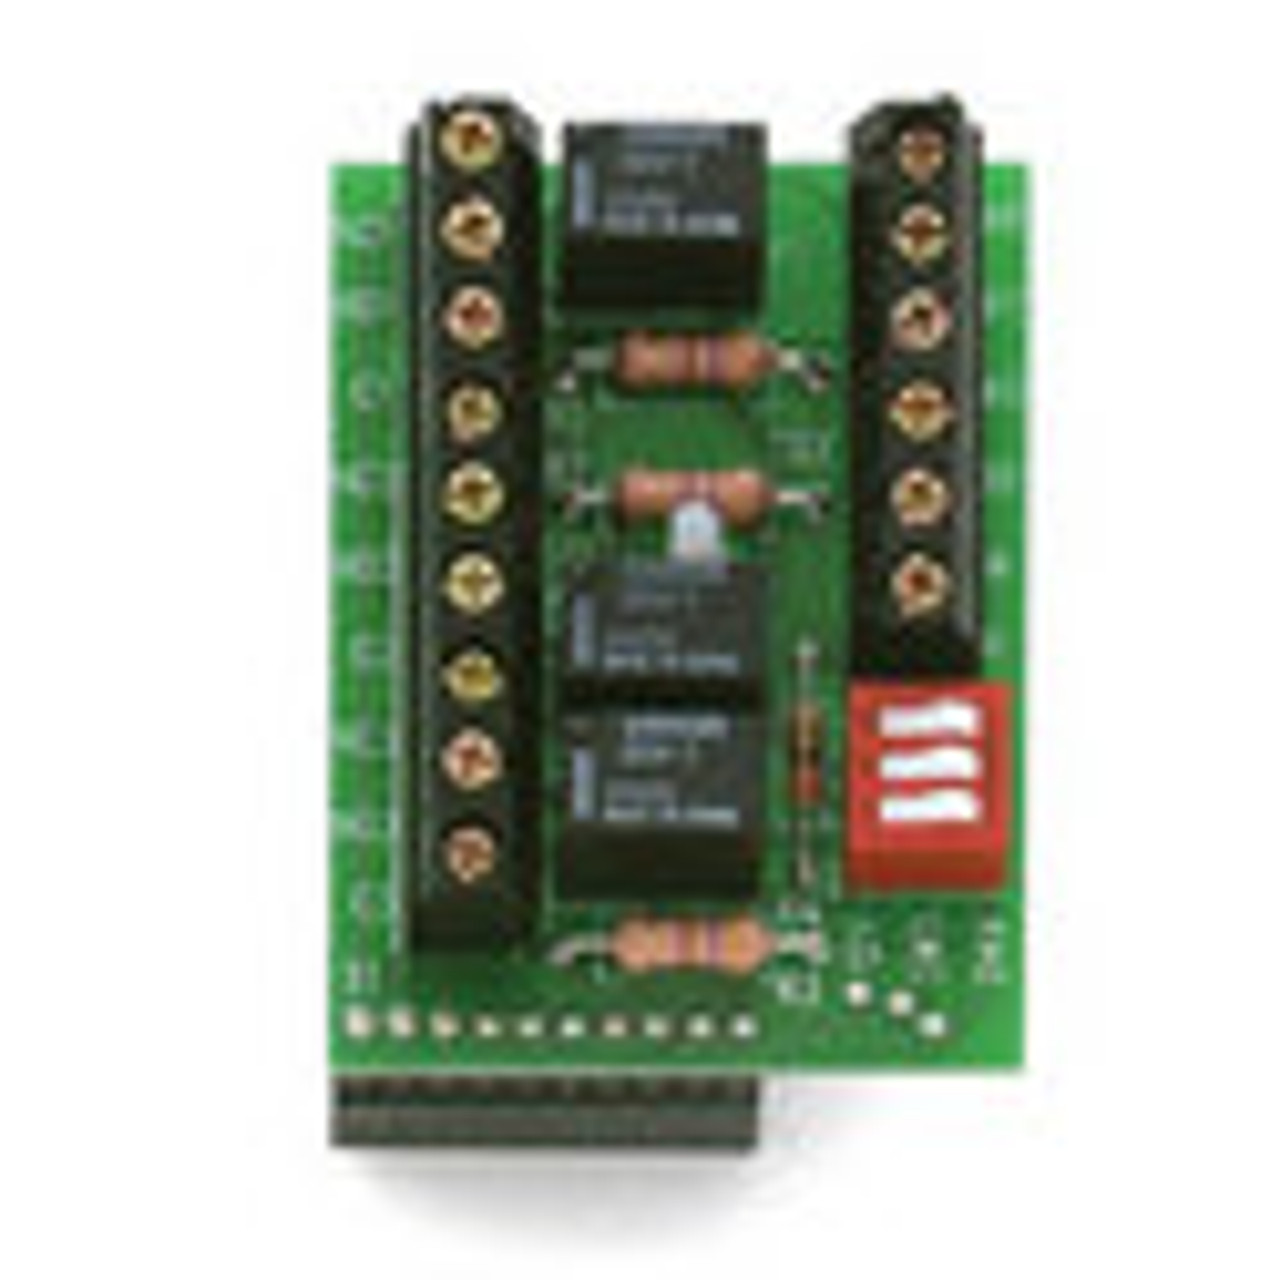 293 IEI Stand-Alone Access Control Relay Board